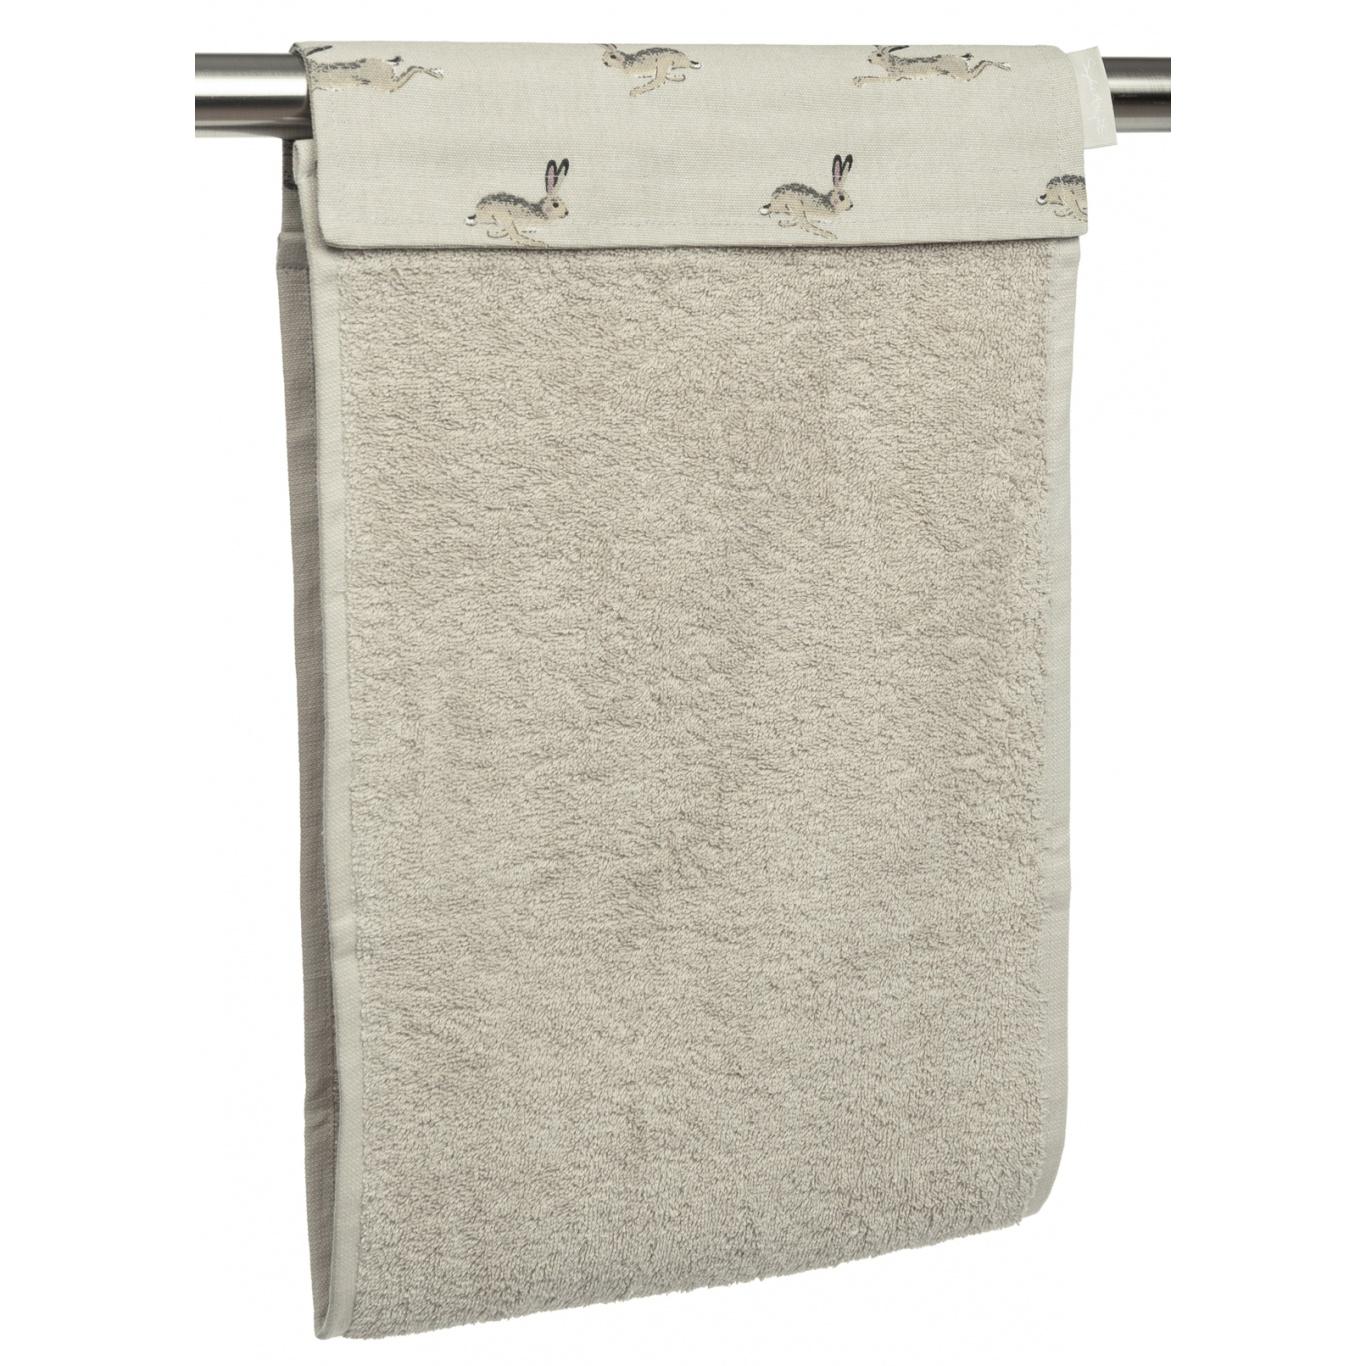 Image of Sophie Allport Hare Roller Hand Towel